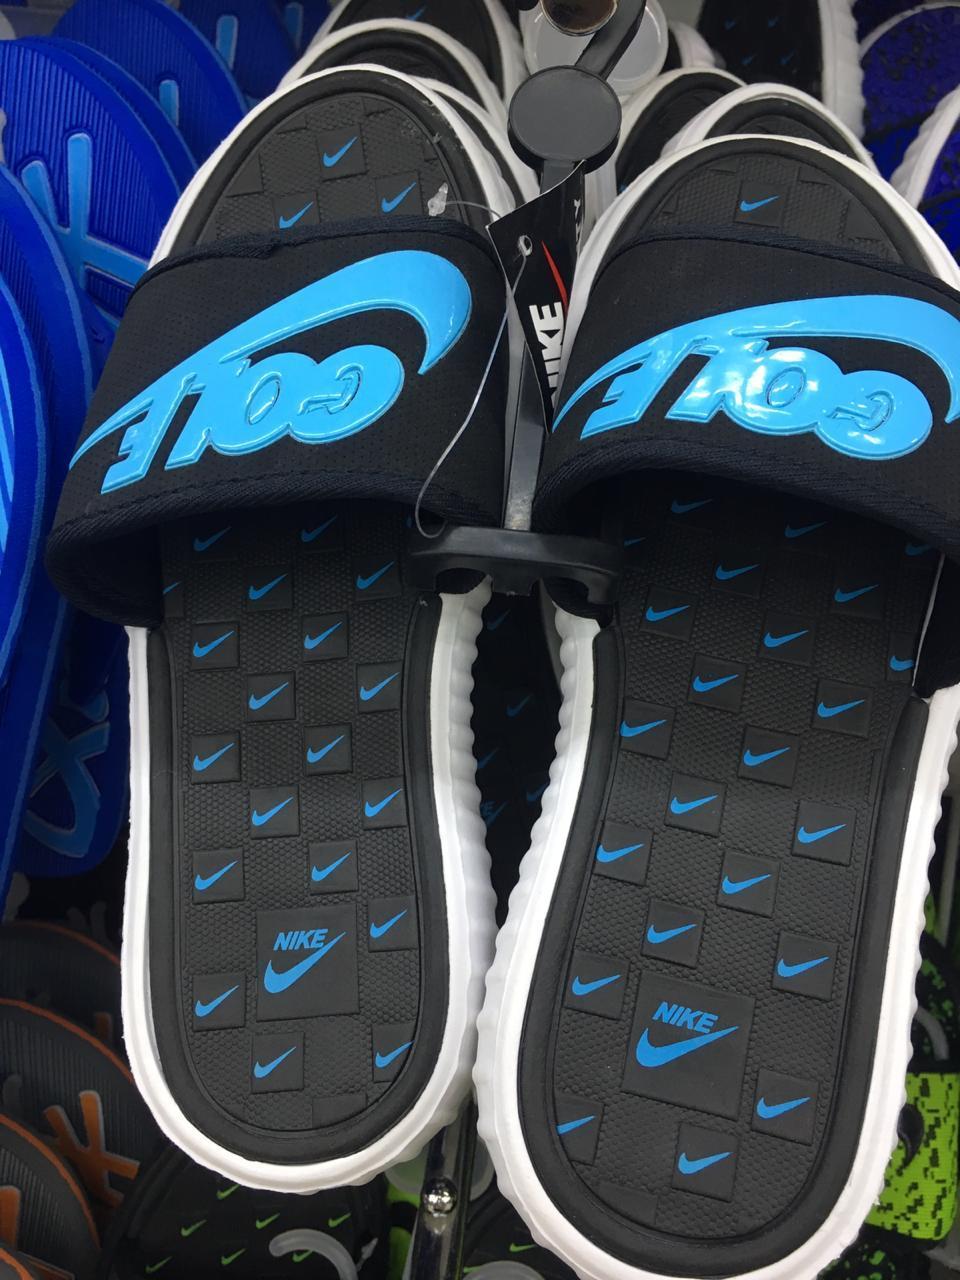 new products 85538 9ef23 Men's Sandals & Slippers Online - Daraz Pakistan